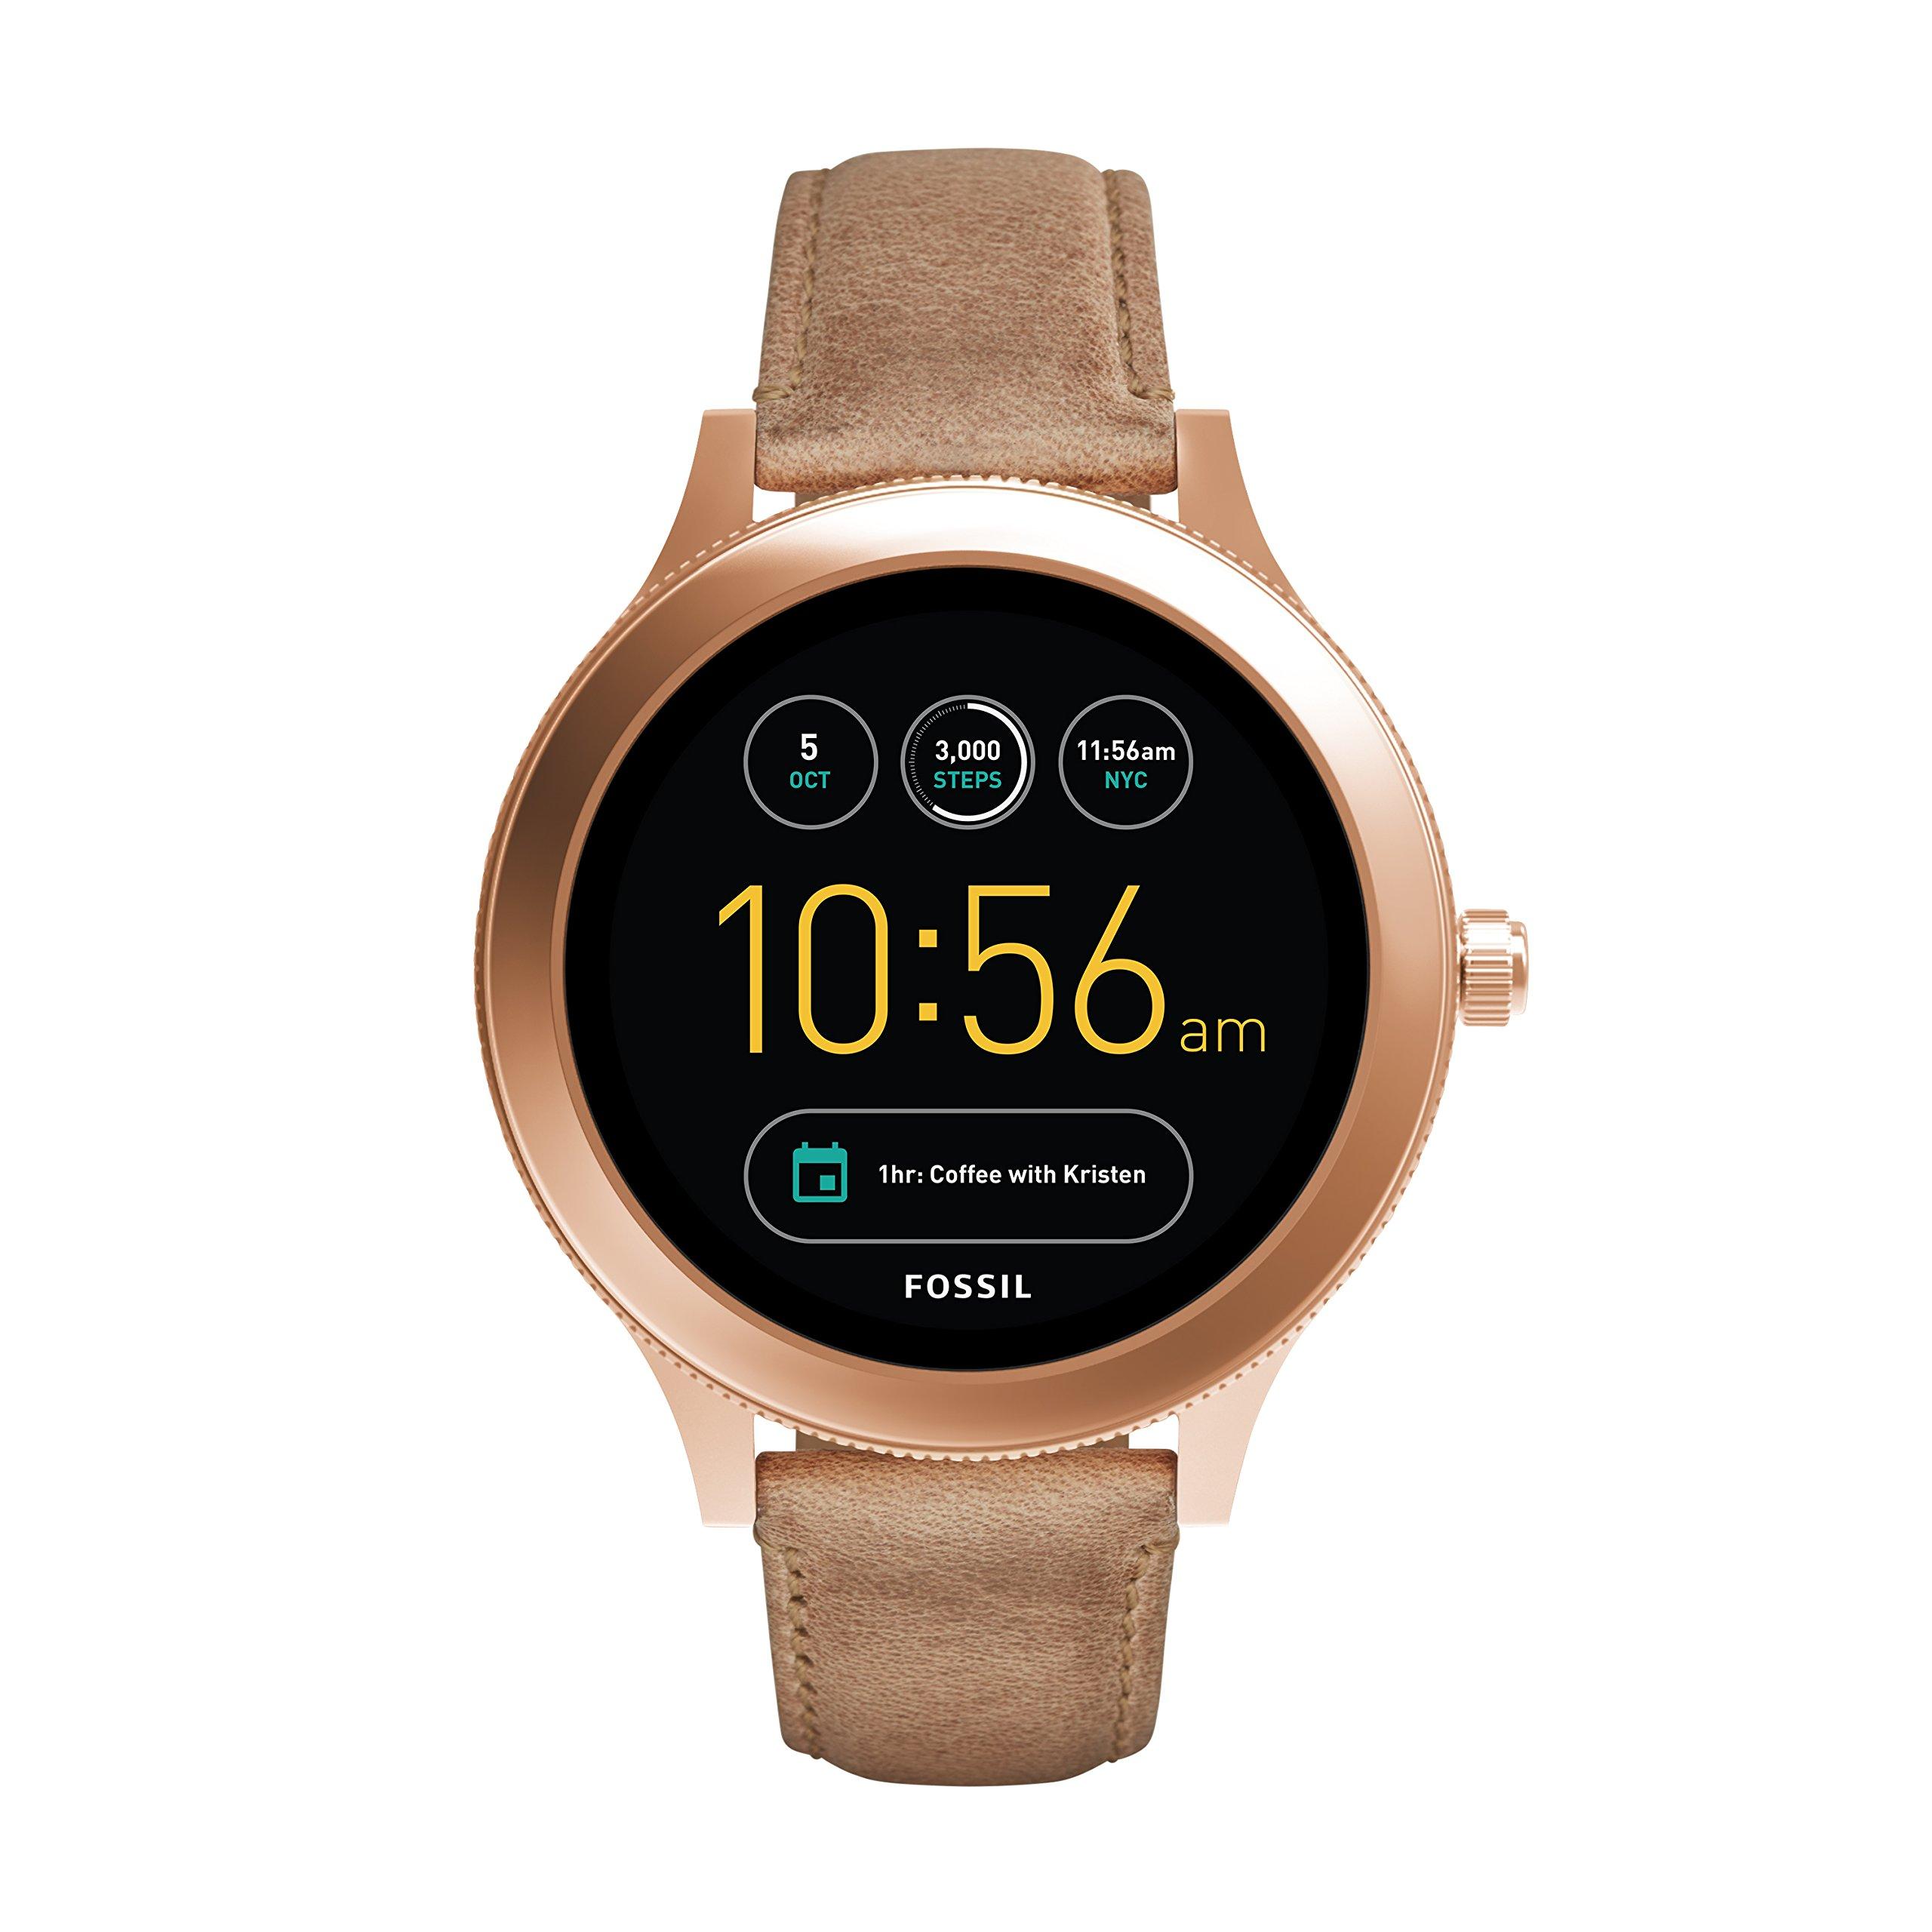 Fossil Women's Gen 3 Venture Stainless Steel Touchscreen Watch with Leather Strap, Beige: ((Model: FTW6005)